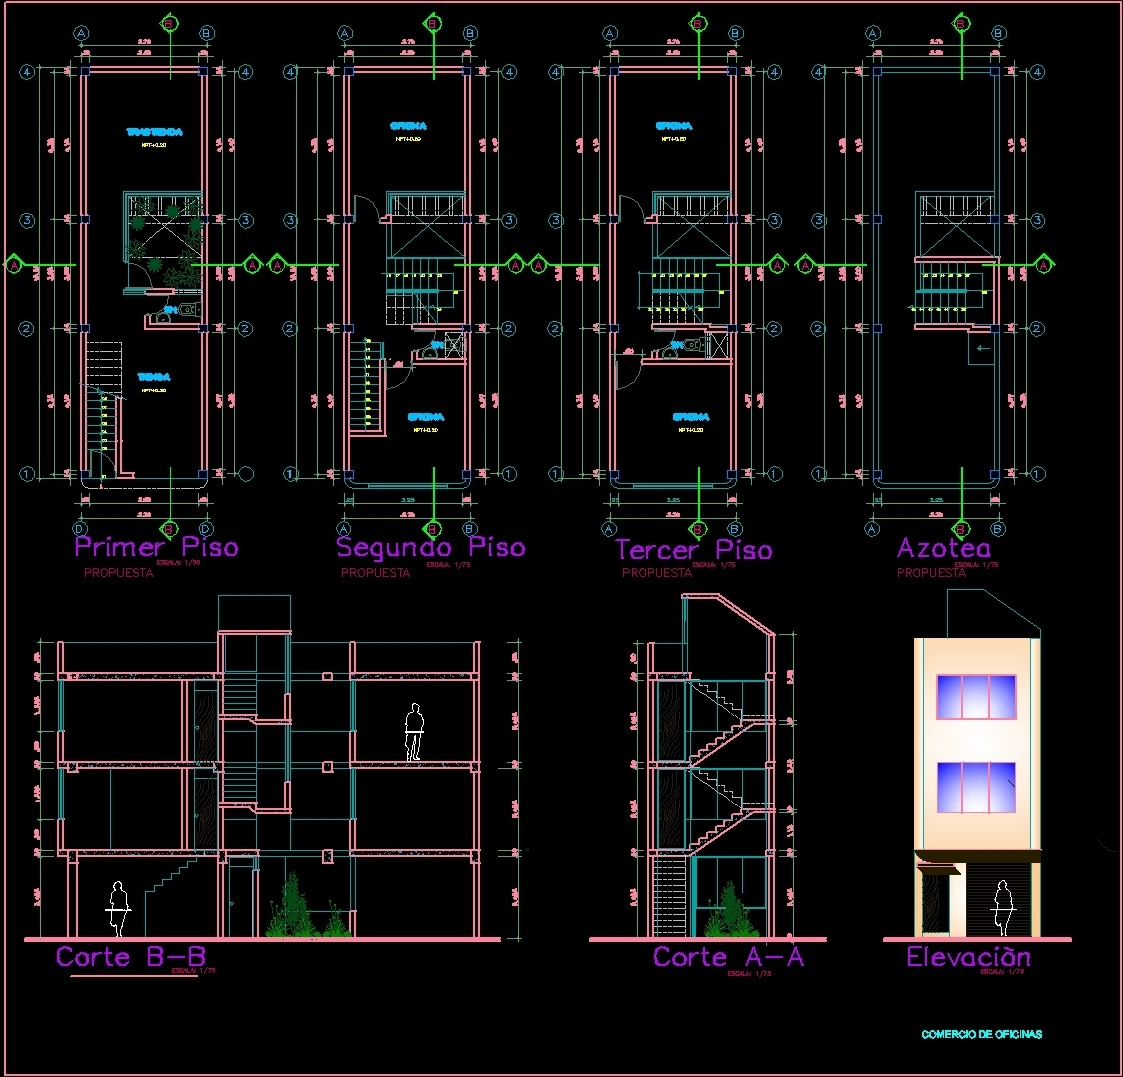 710 Gambar Rumah Minimalis Autocad HD Terbaru